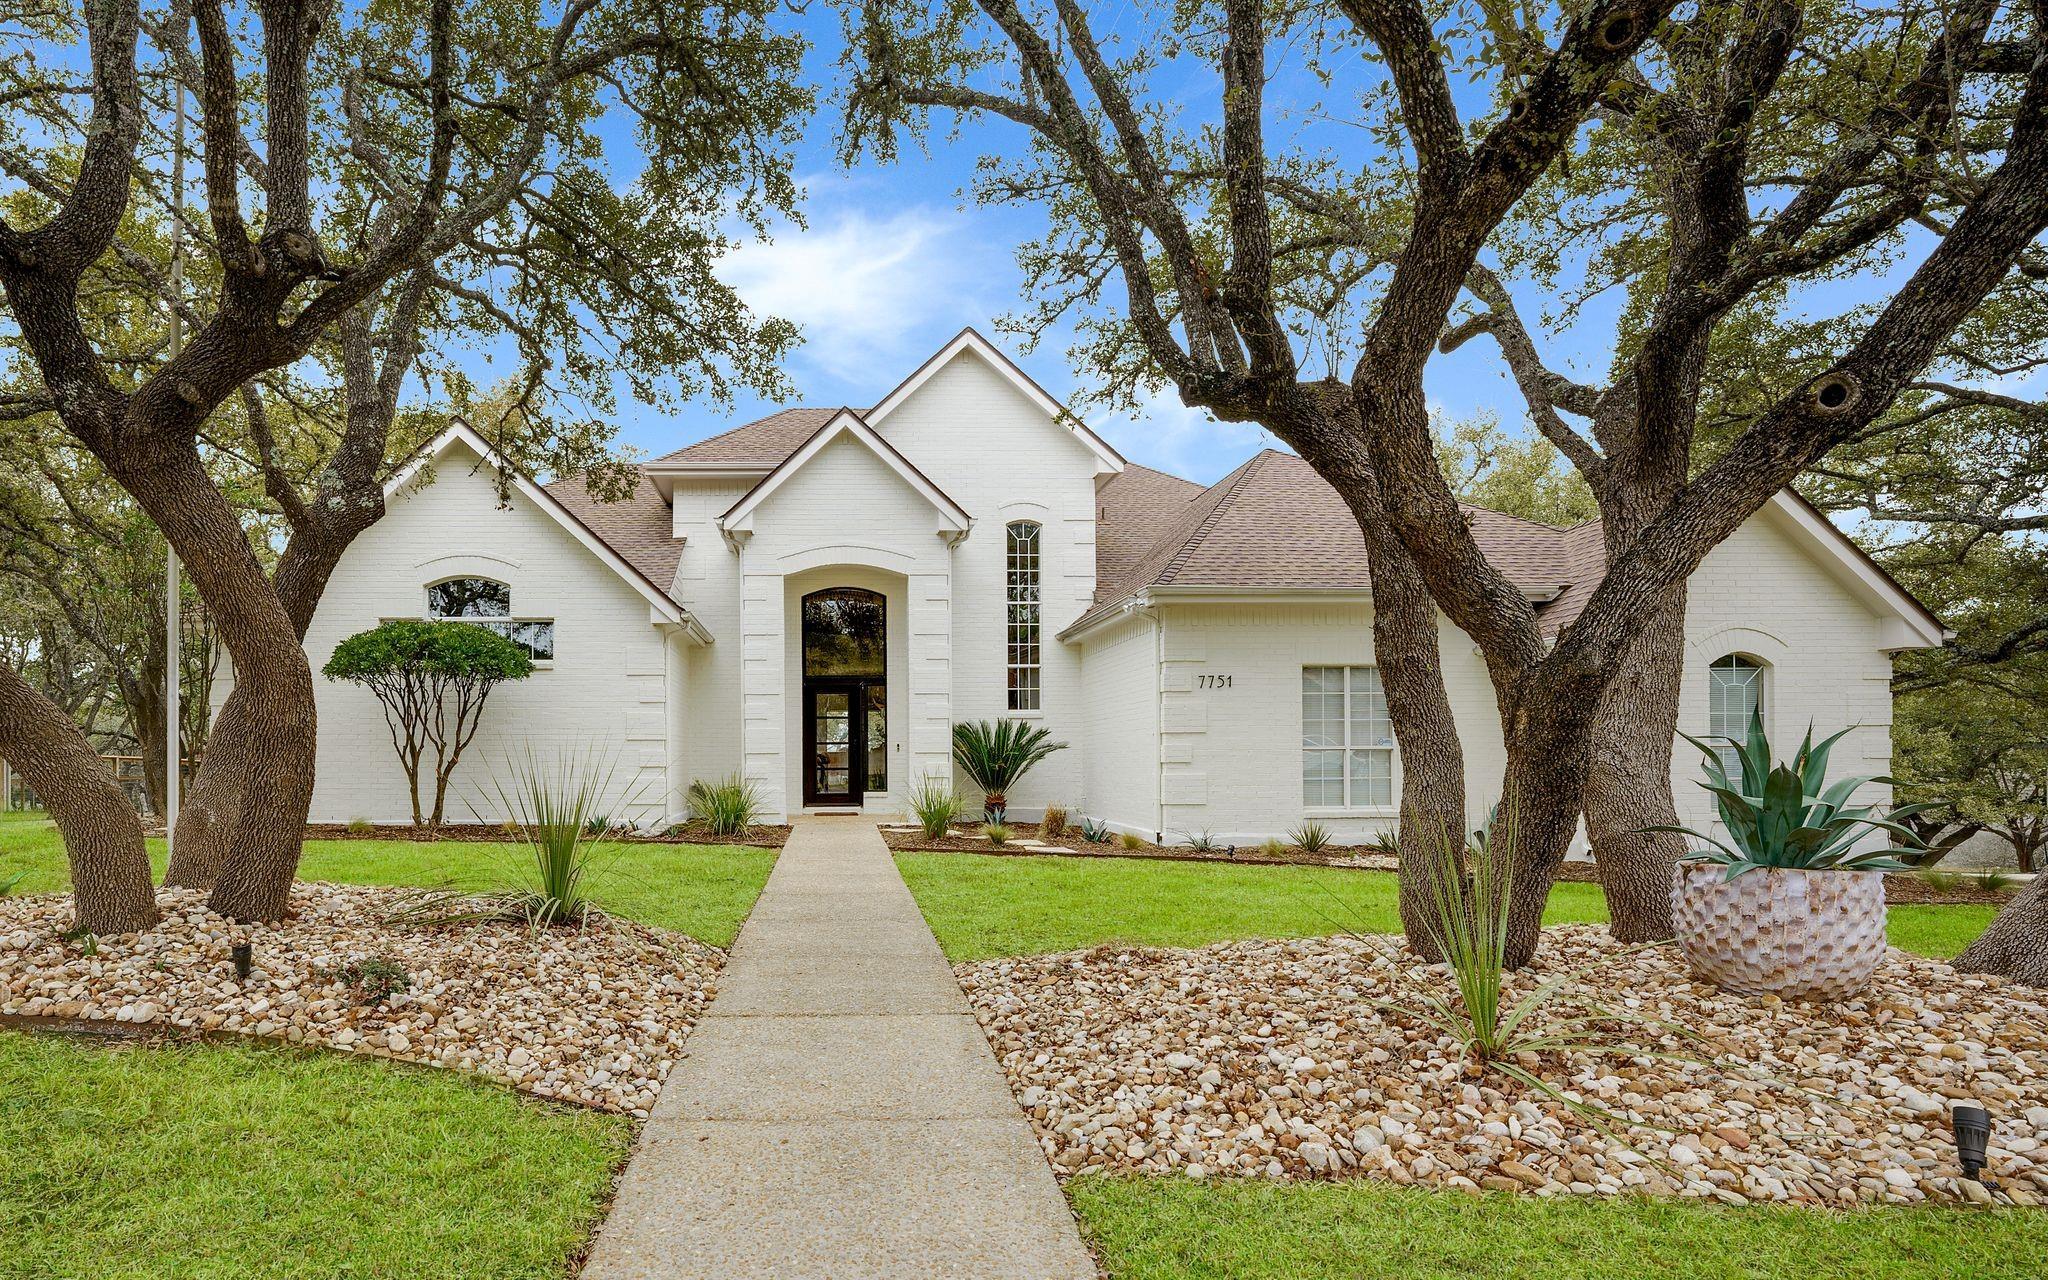 7751 Fair Oaks Parkway Property Photo - Fair Oaks Ranch, TX real estate listing